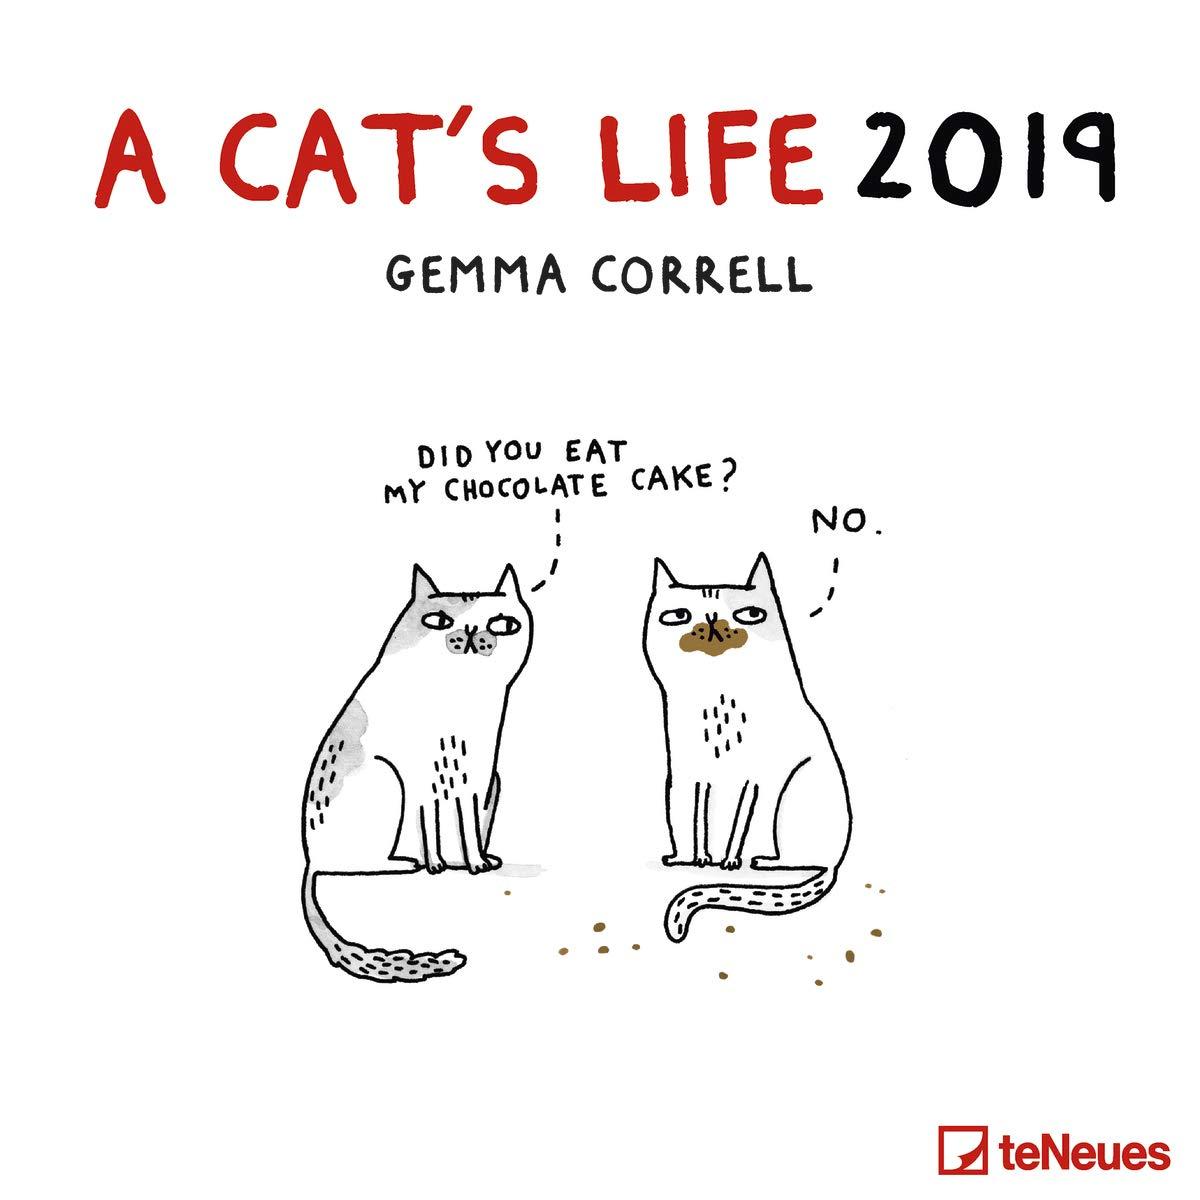 CATS LIFE A 2019 Calendar - Soporte de Pared Cuadrado (30 cm x 30 cm): Amazon.es: Productos para mascotas